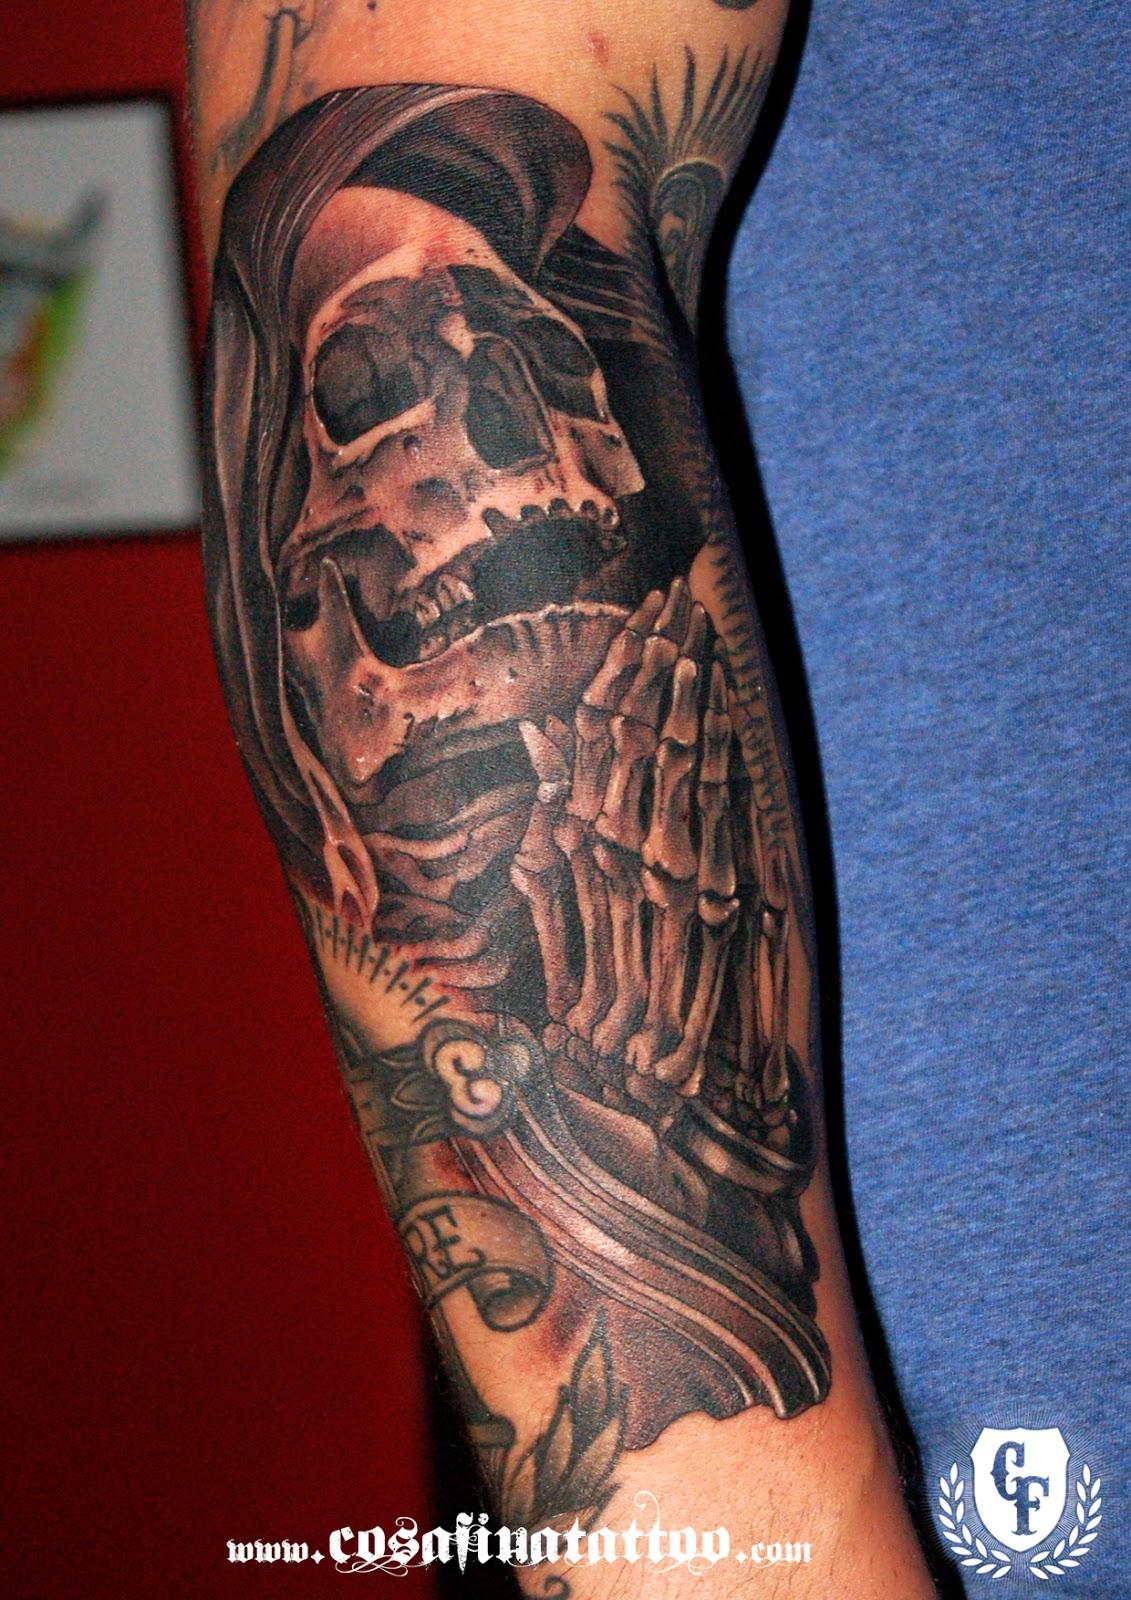 Cosafina Tattoo Carlos Art Studio Tatuaje Calavera Manos Rezando